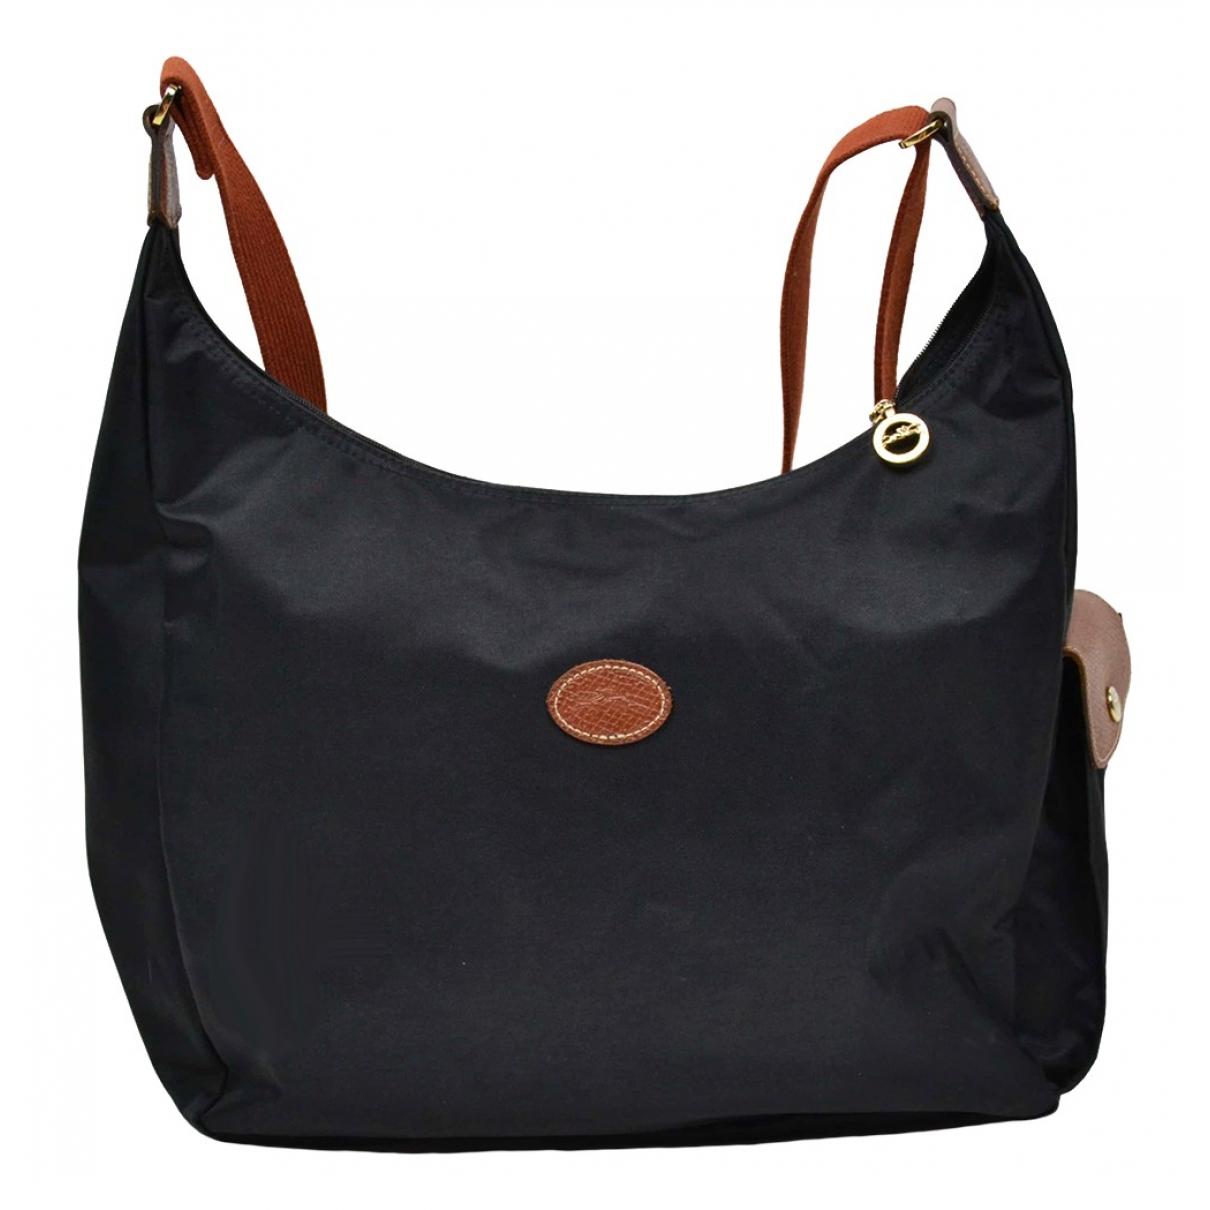 Longchamp \N Black Cloth handbag for Women \N